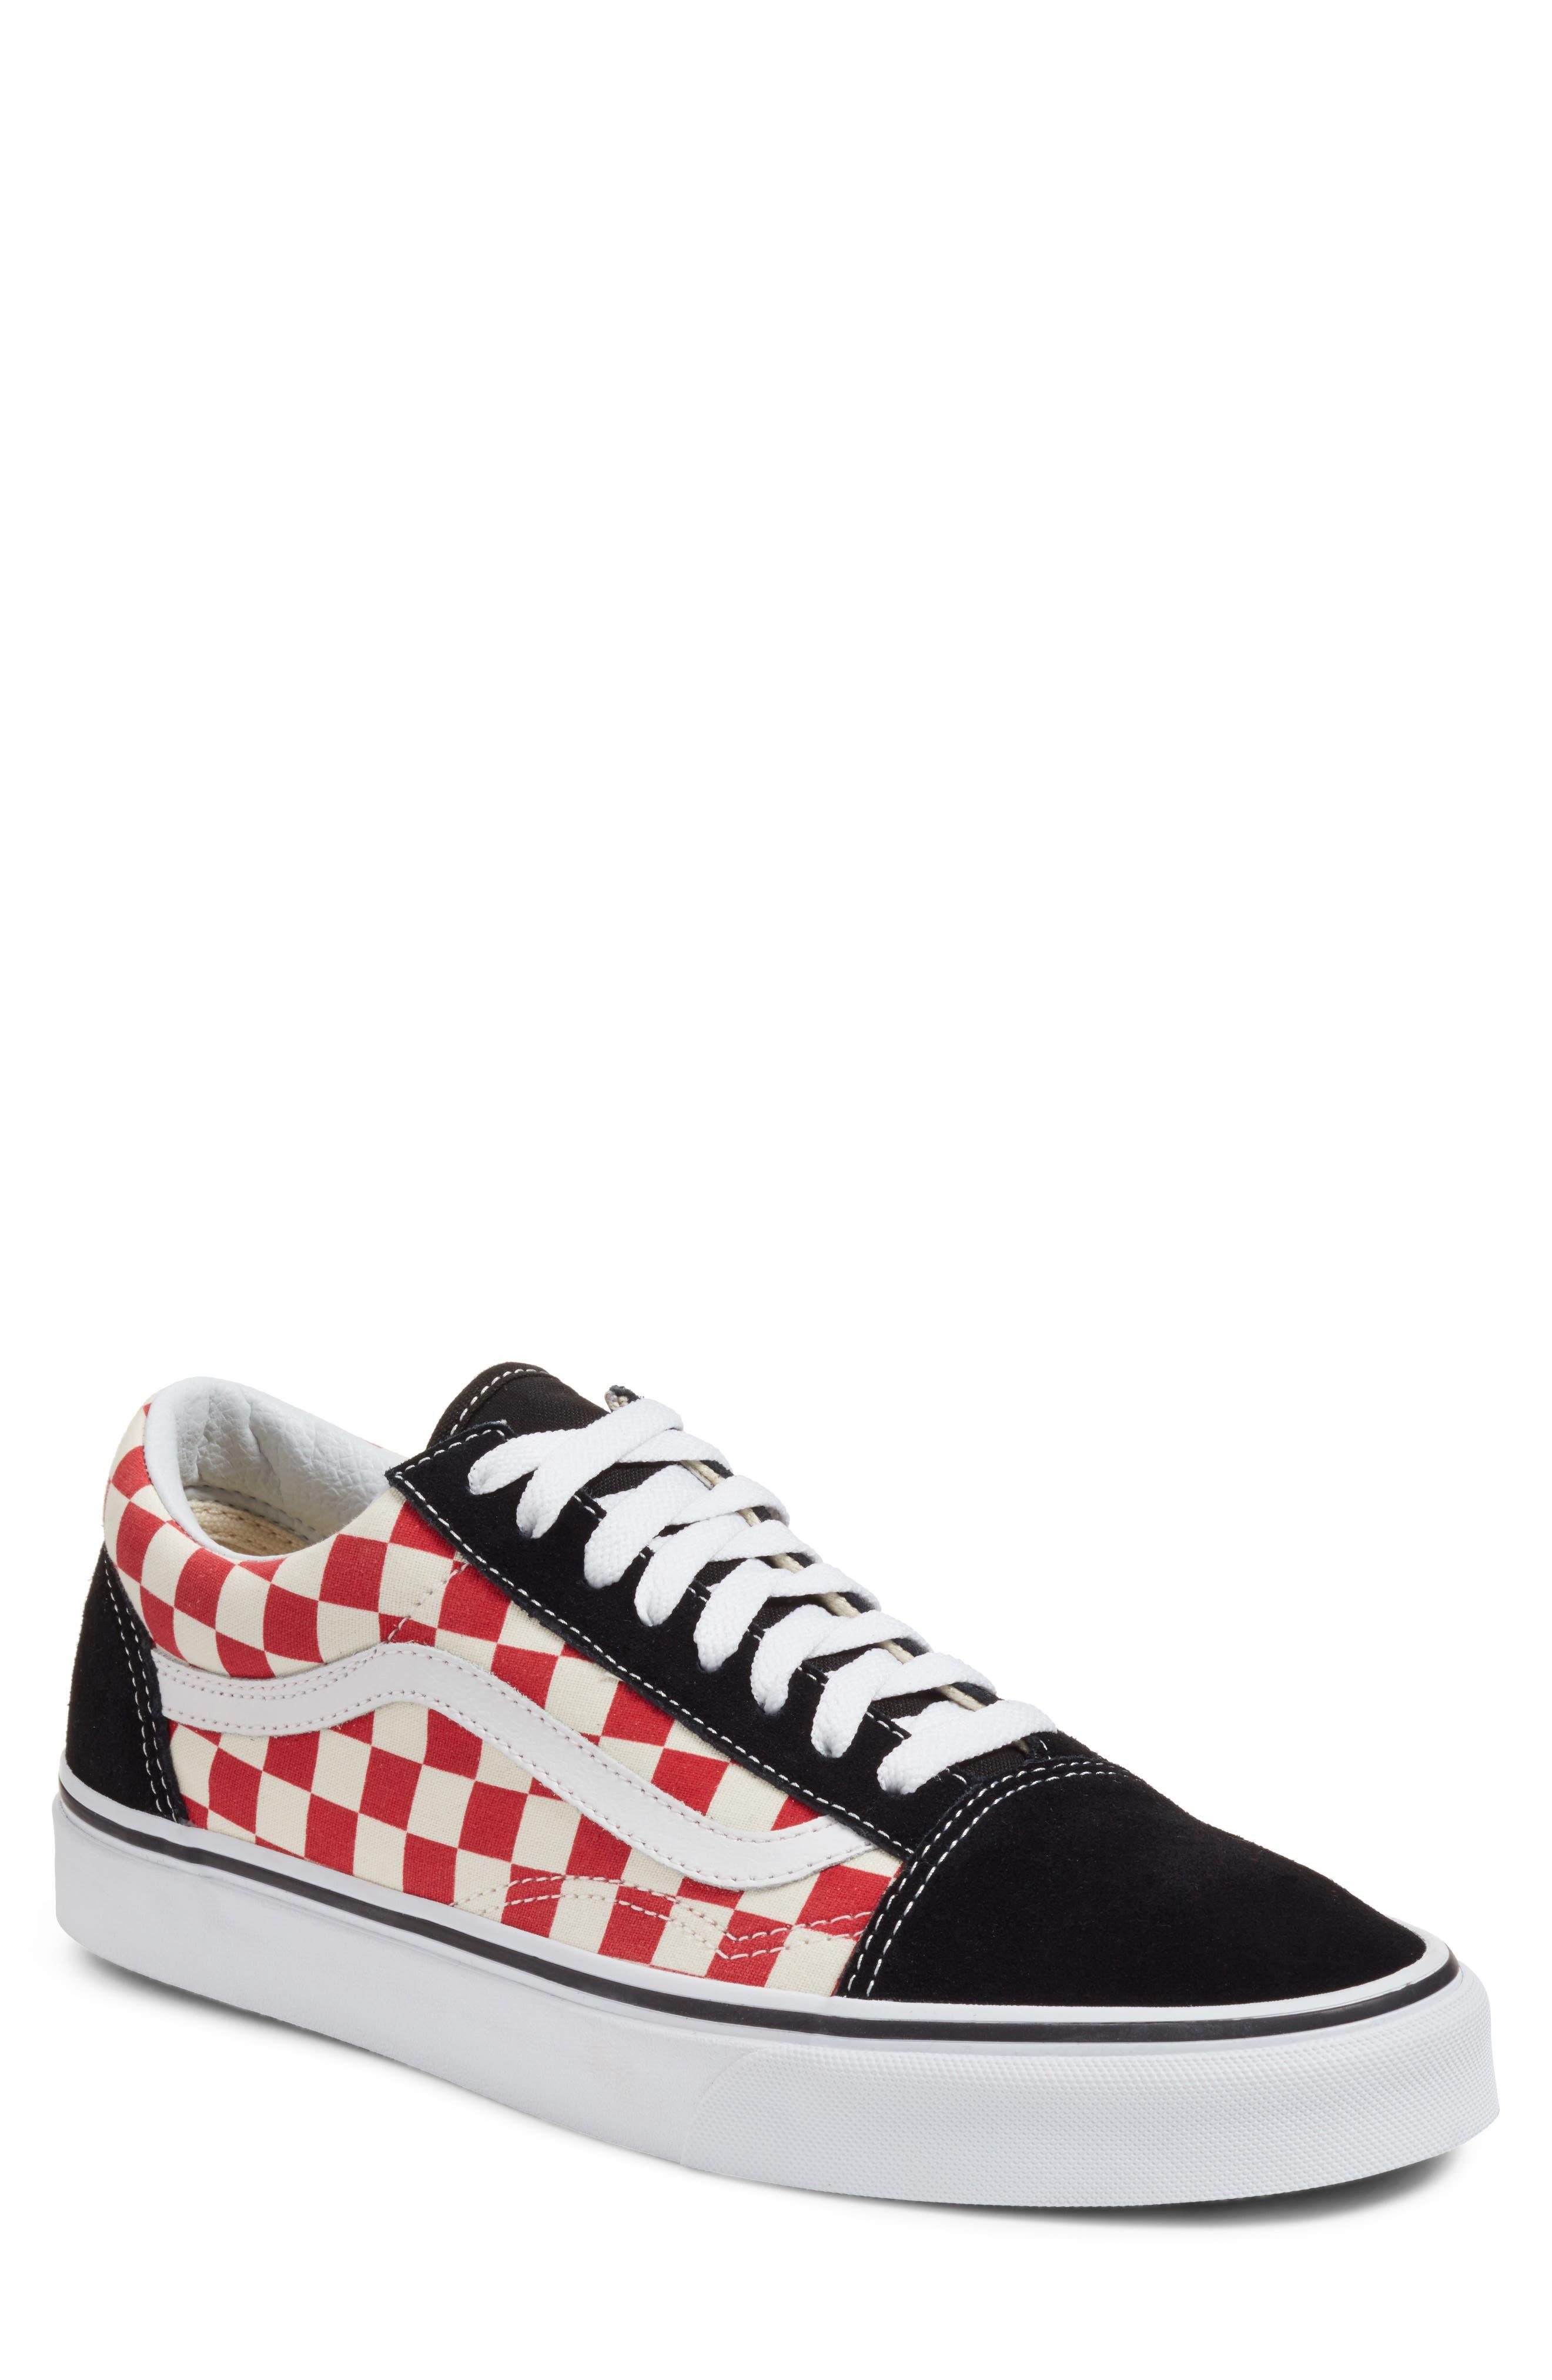 Old Skool Sneaker,                             Main thumbnail 1, color,                             Black/ Red Checkerboard